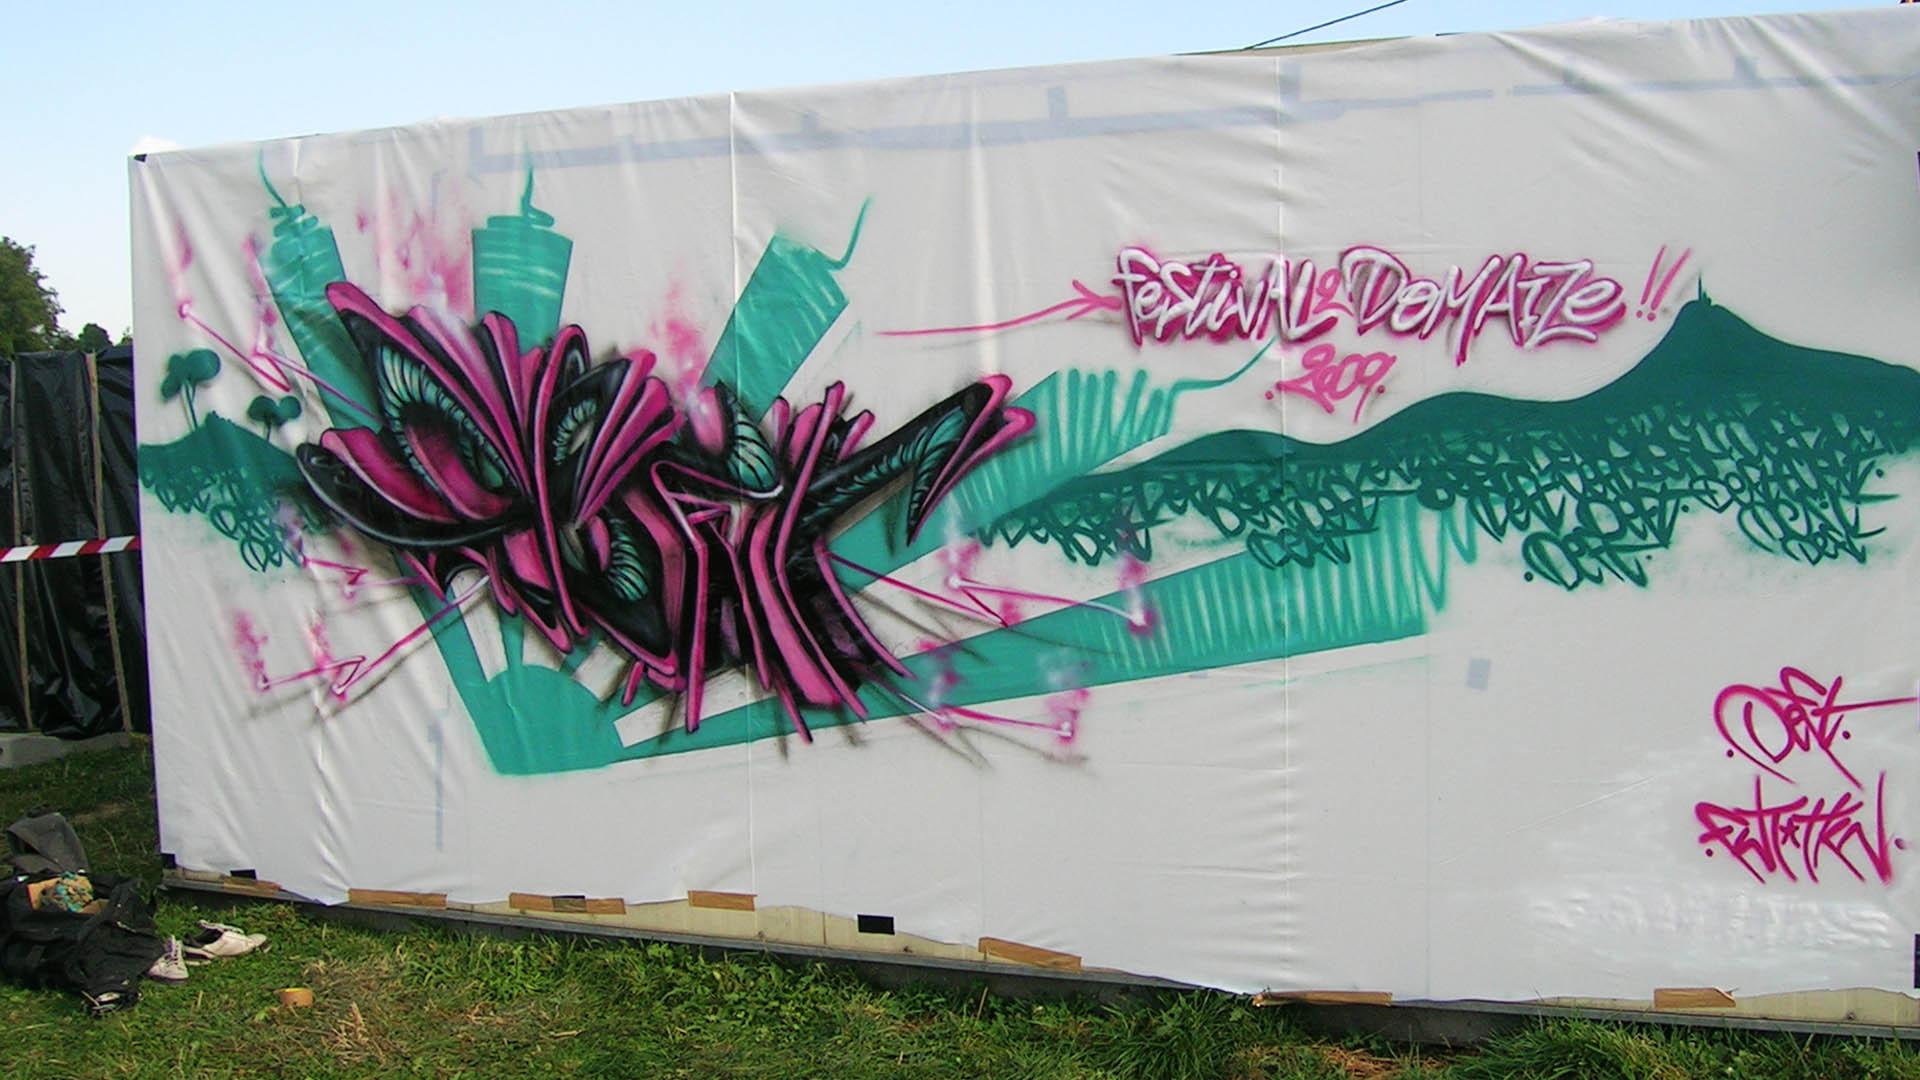 Deft - Graffiti - Festival de Domaize